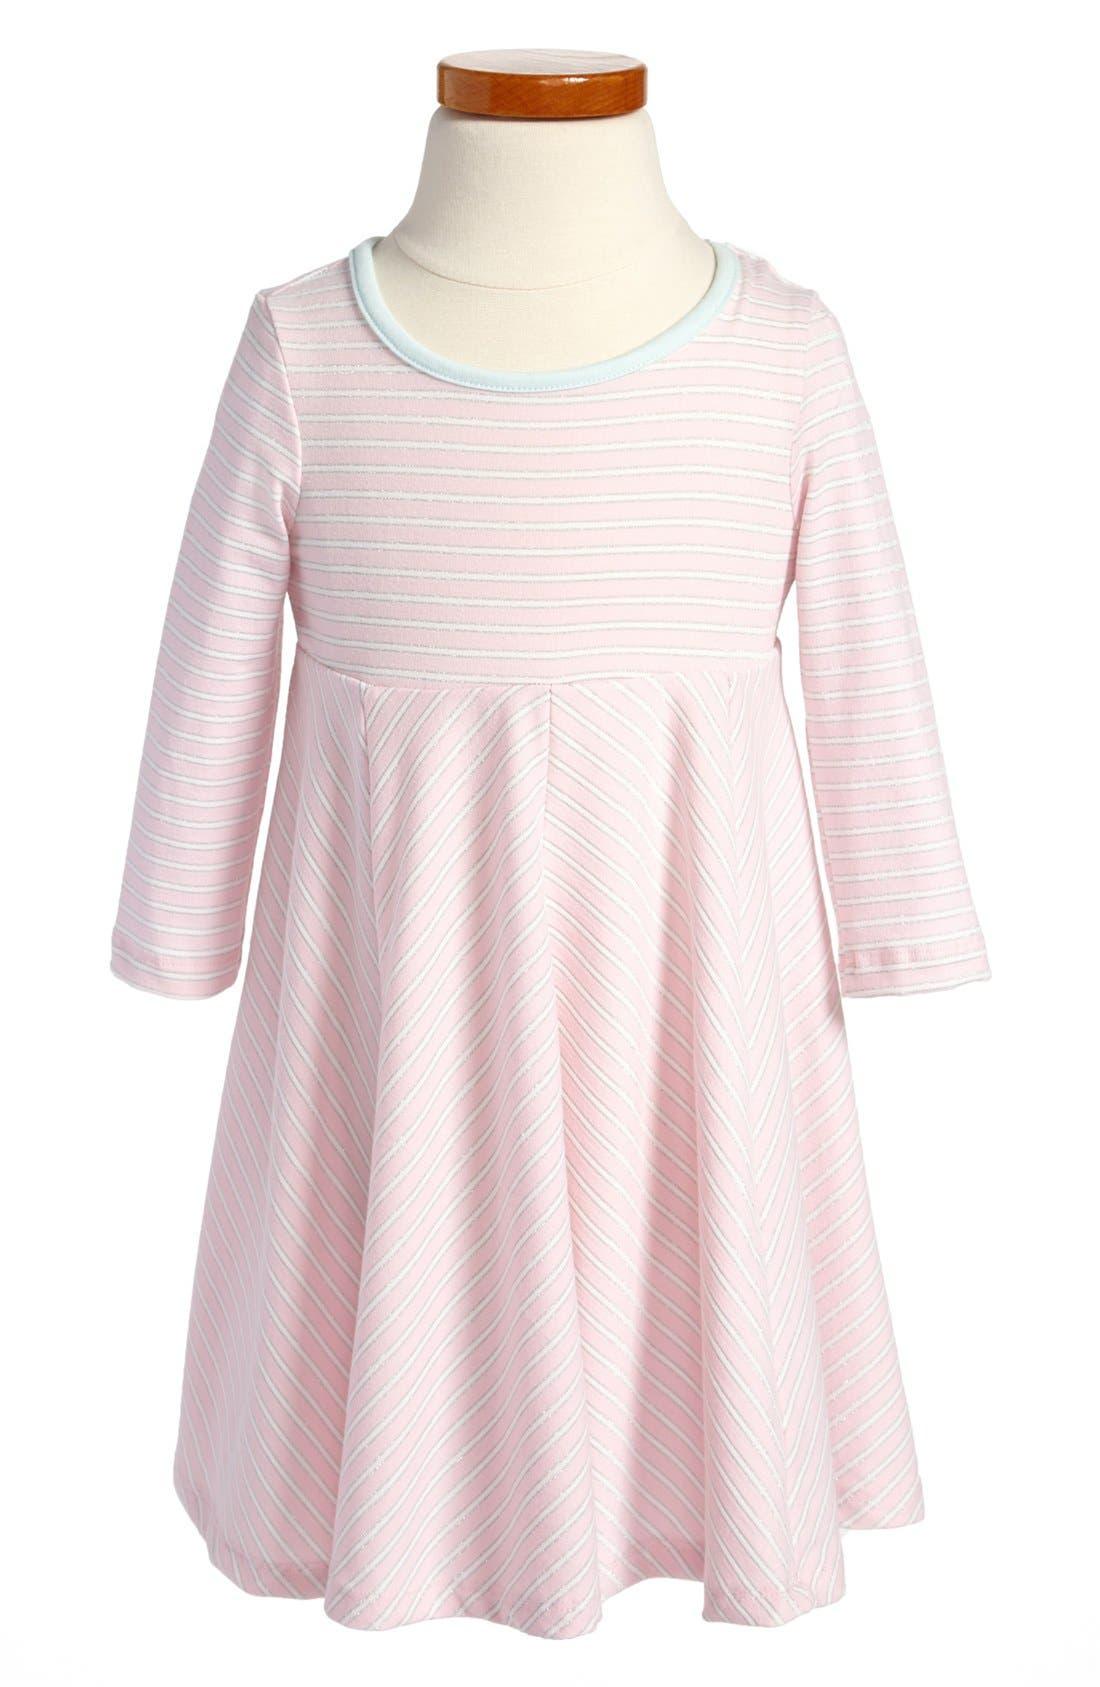 Alternate Image 1 Selected - Pippa & Julie Stripe Knit Dress (Toddler Girls)